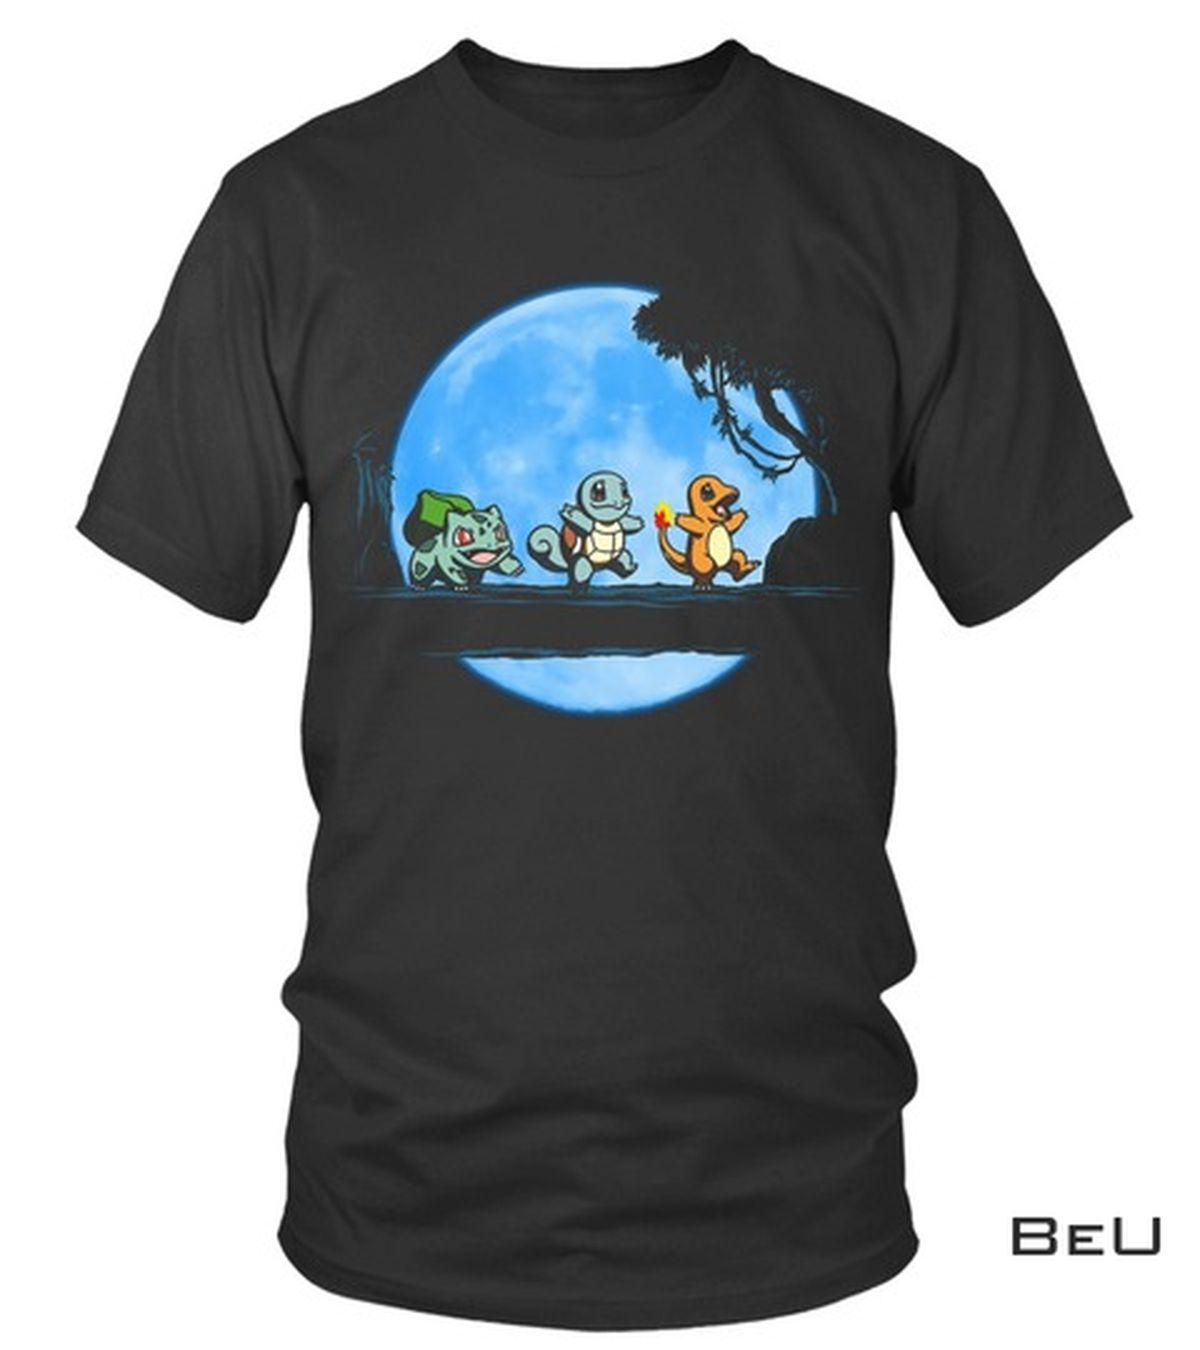 Unisex Pokemon Baby Bulbasaur Squirtle Charizard Blue Moon Shirt, hoodie, tank top